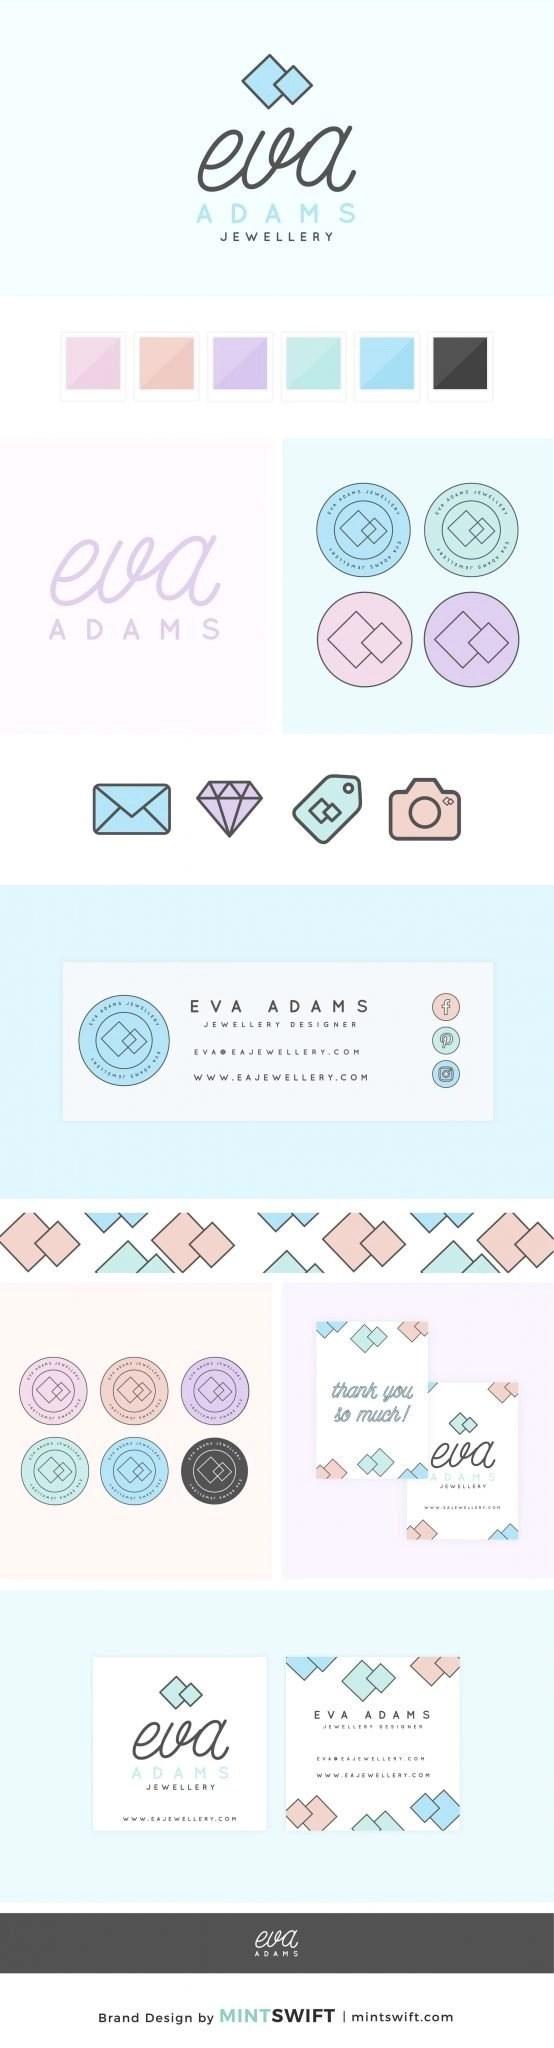 Eva Adams - Brand Design Package - MintSwift